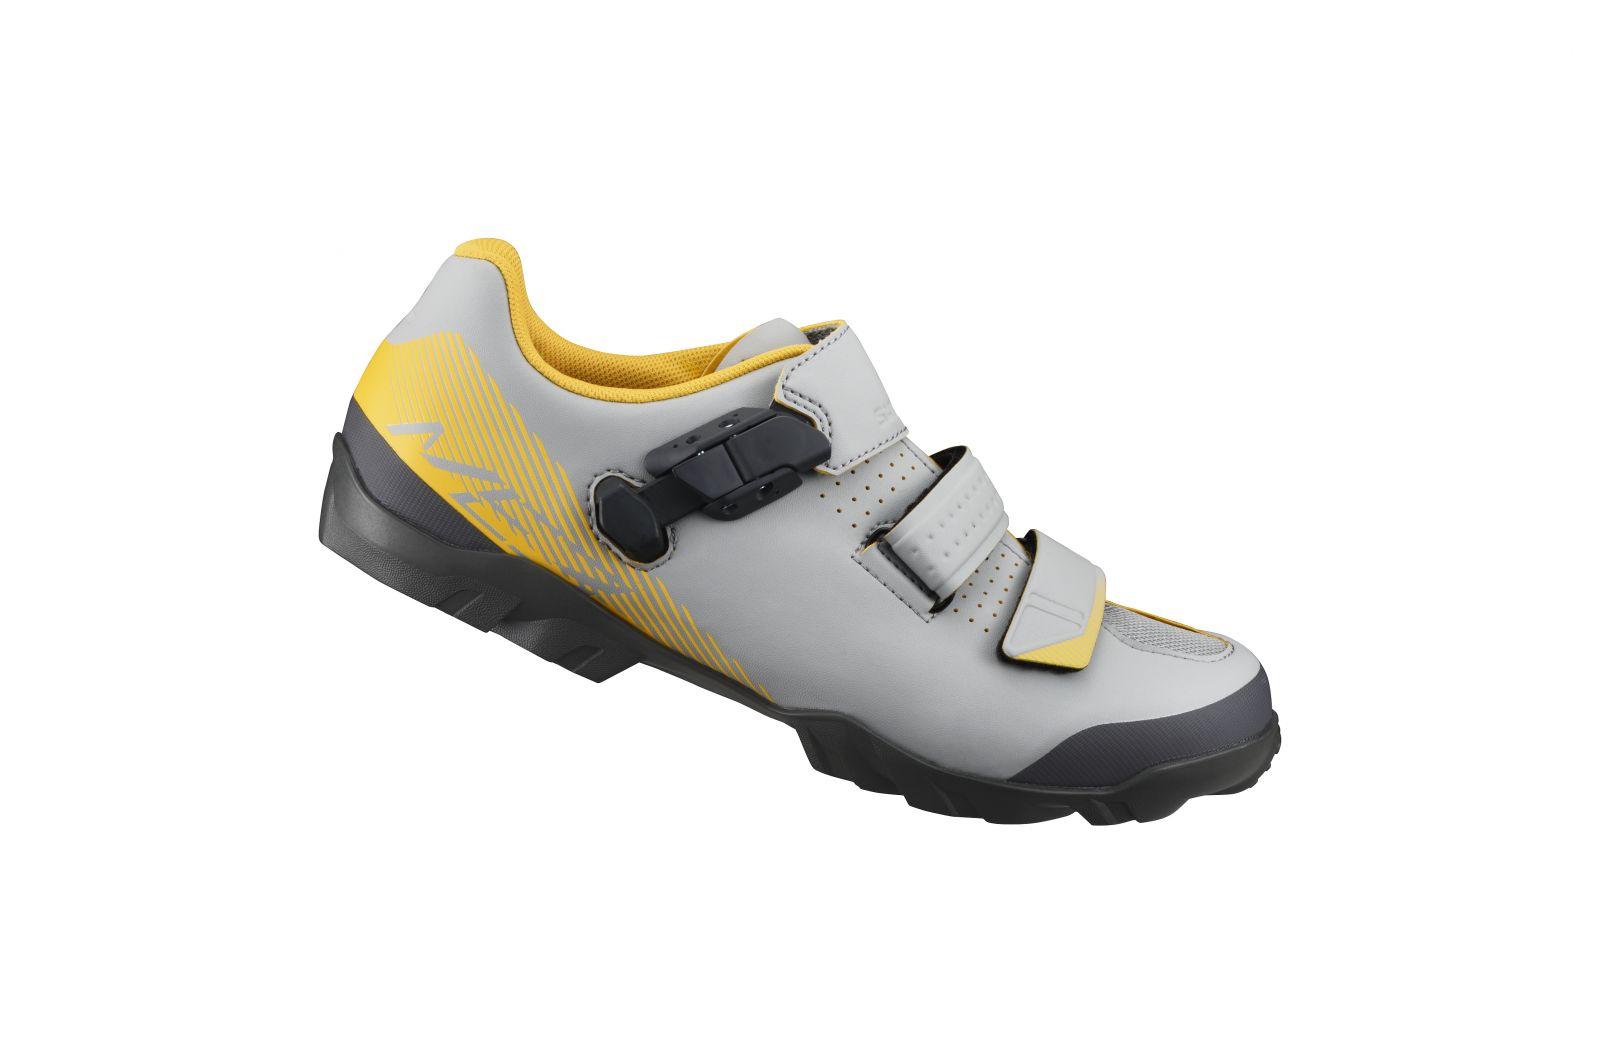 SHIMANO MTB obuv SH-ME300MG, šedá žlutá, 46